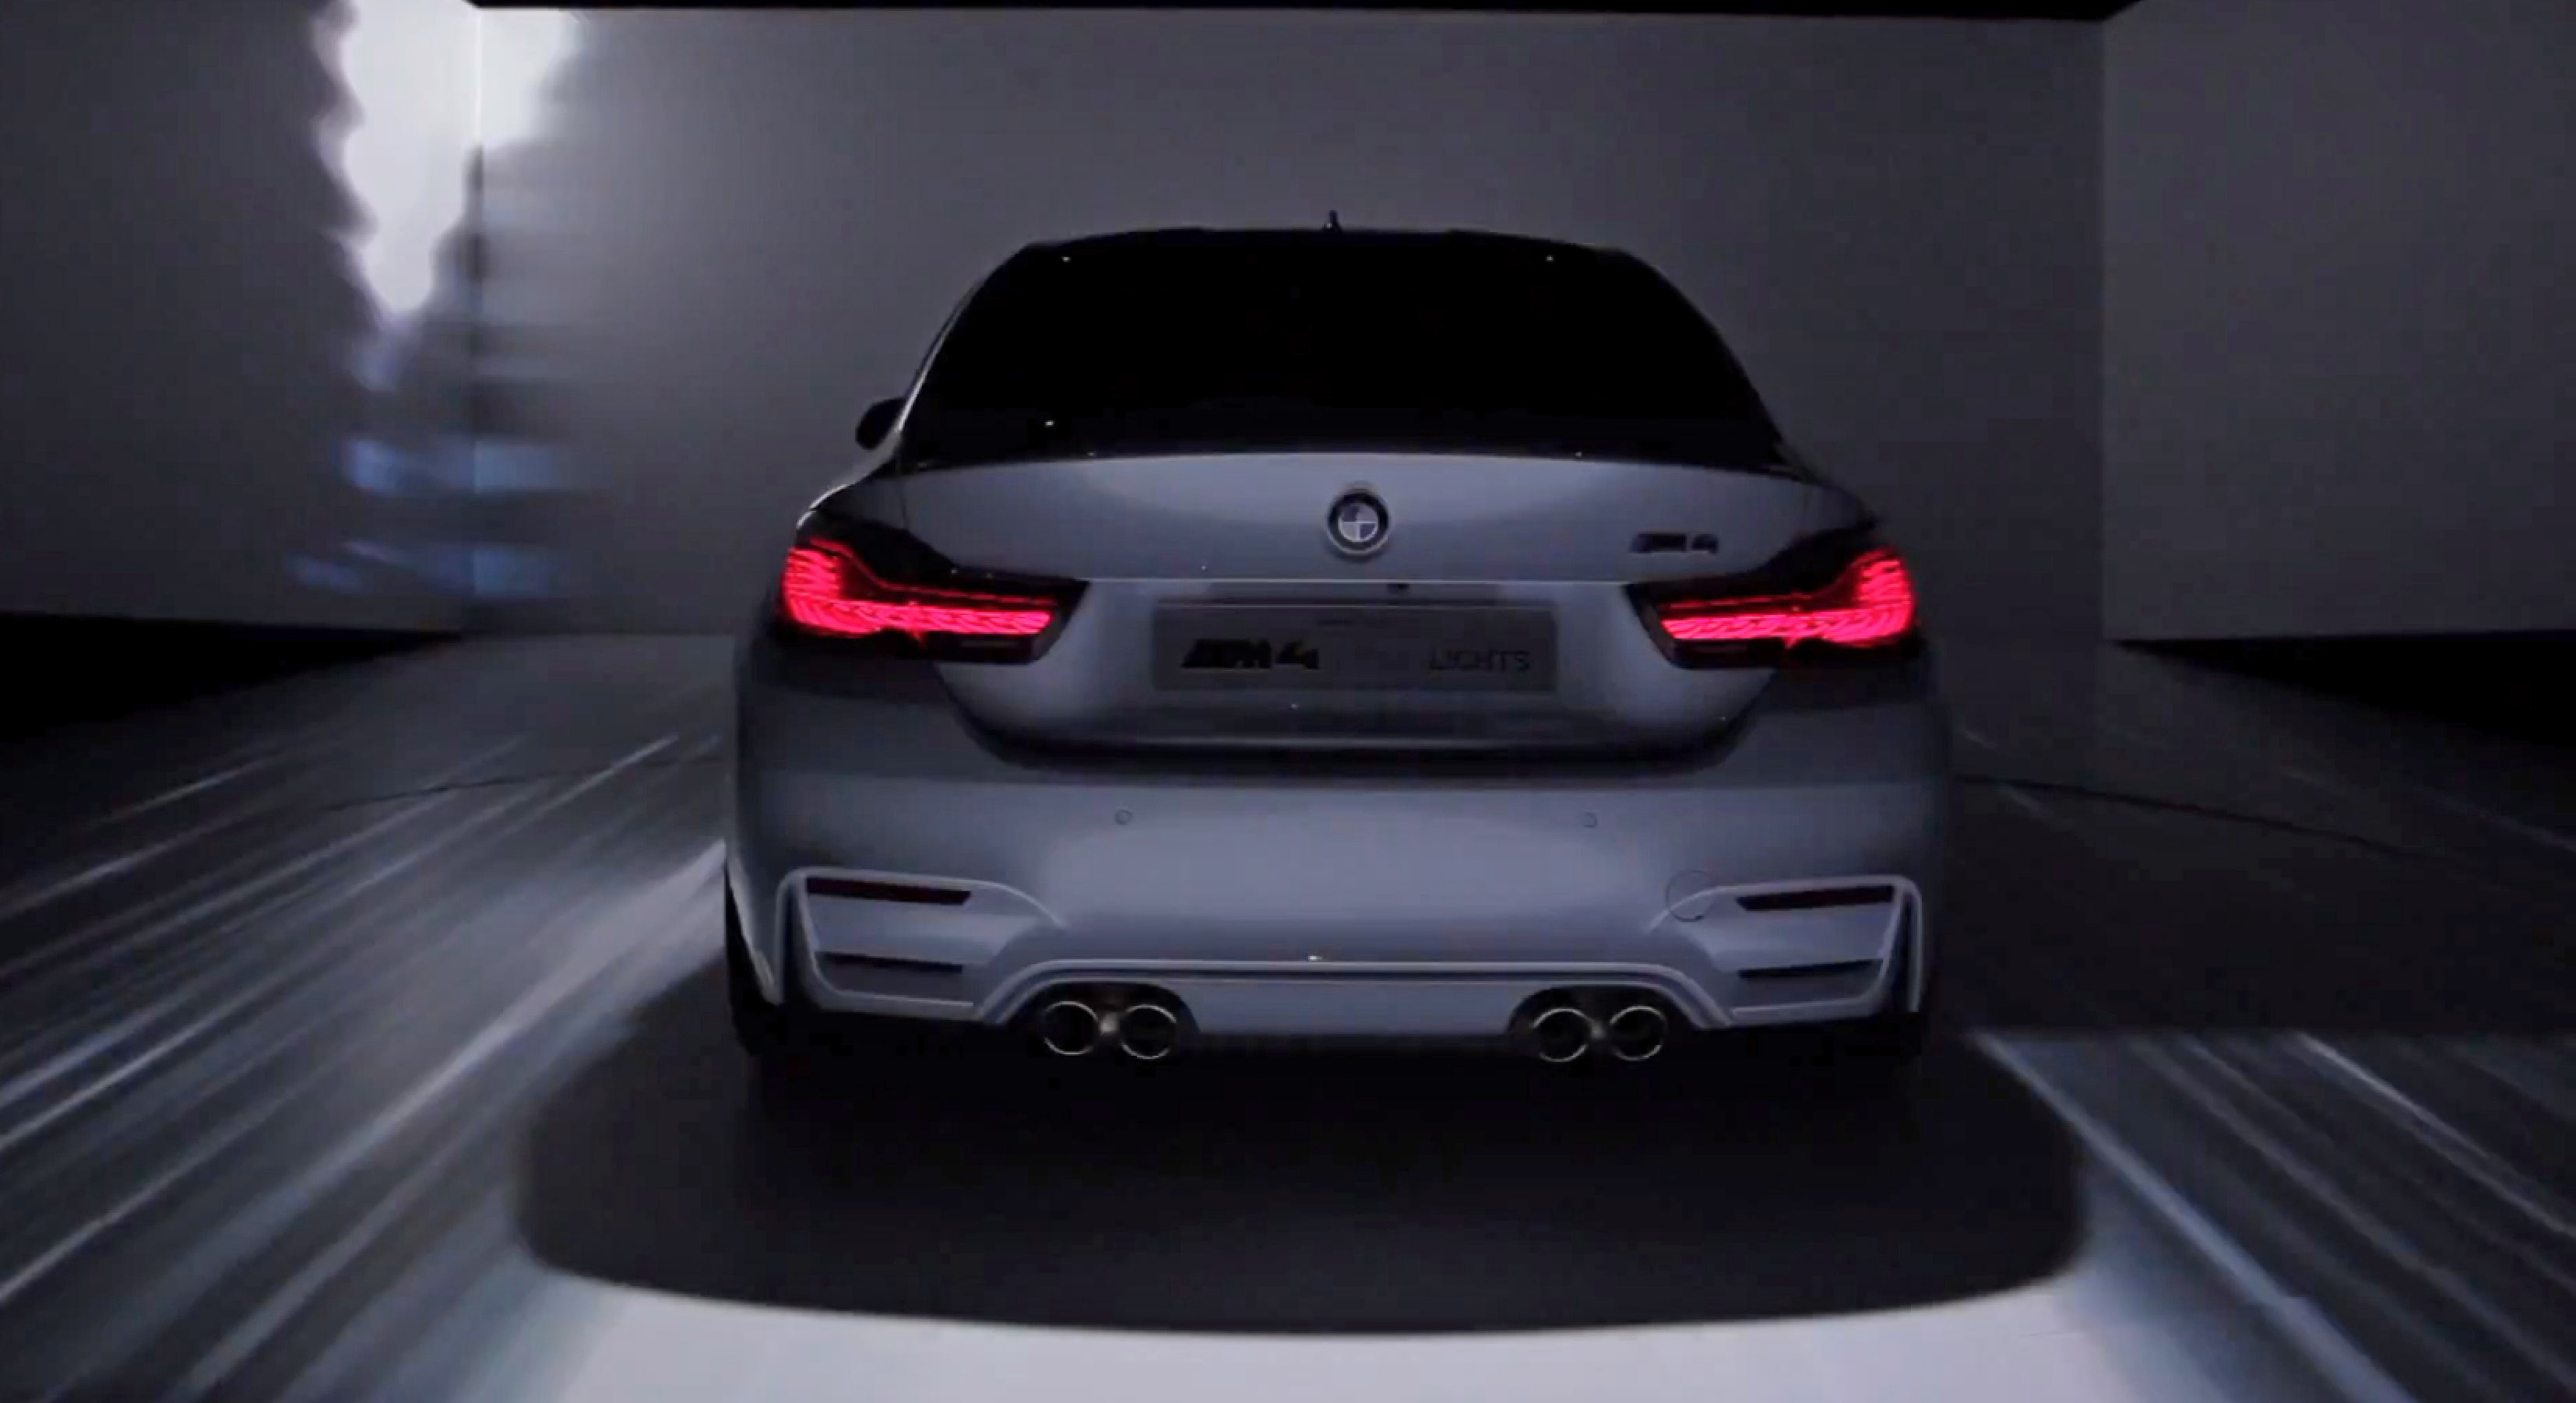 Bmw X3 2017 Interior >> BMW M4 Concept Iconic Lights. Introducing BMW's LaserLight ...